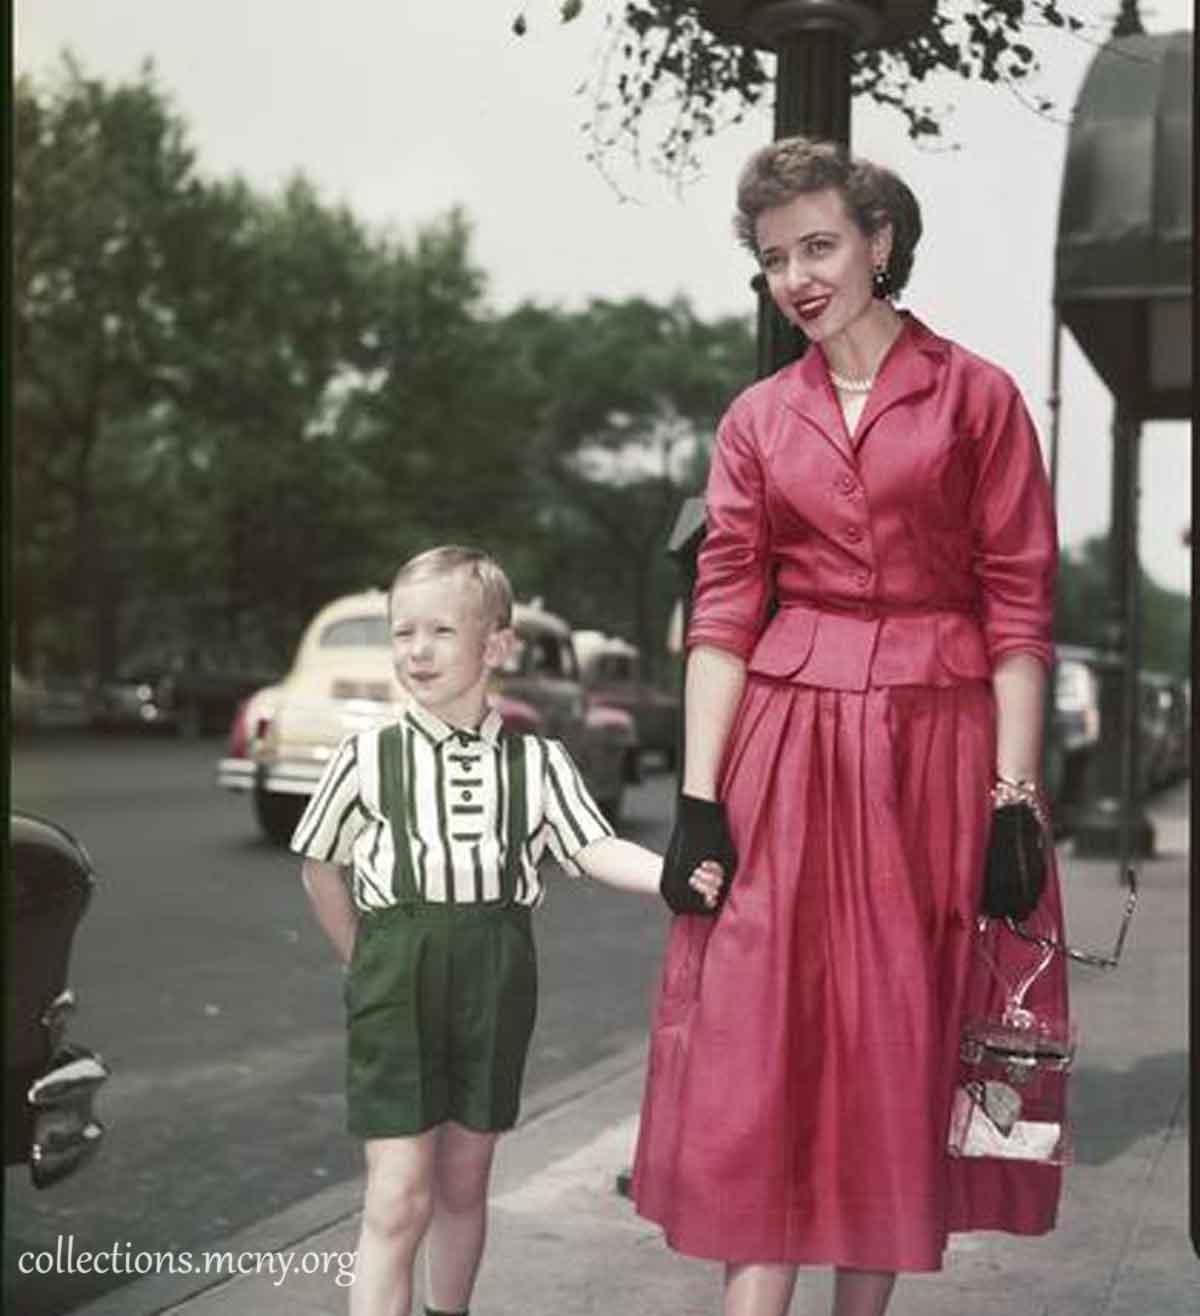 1950s-Fashion---Fifth-Avenue-Style-in-1952---Laraine-Day2